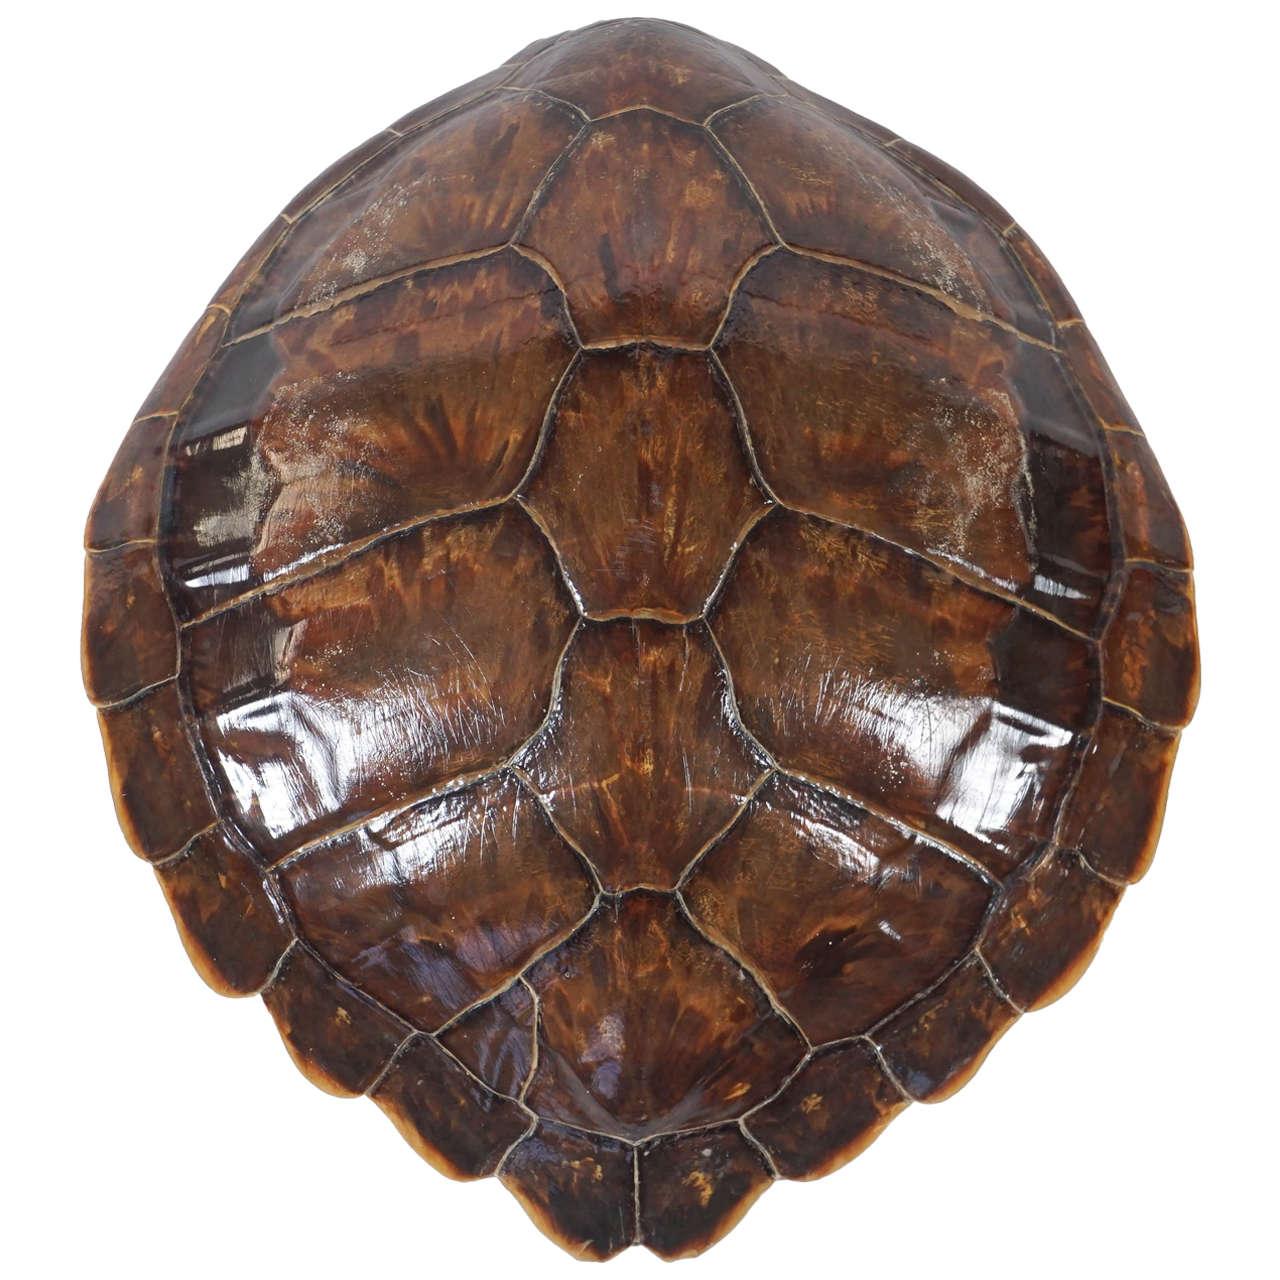 Antique Tortoise Shell Furniture